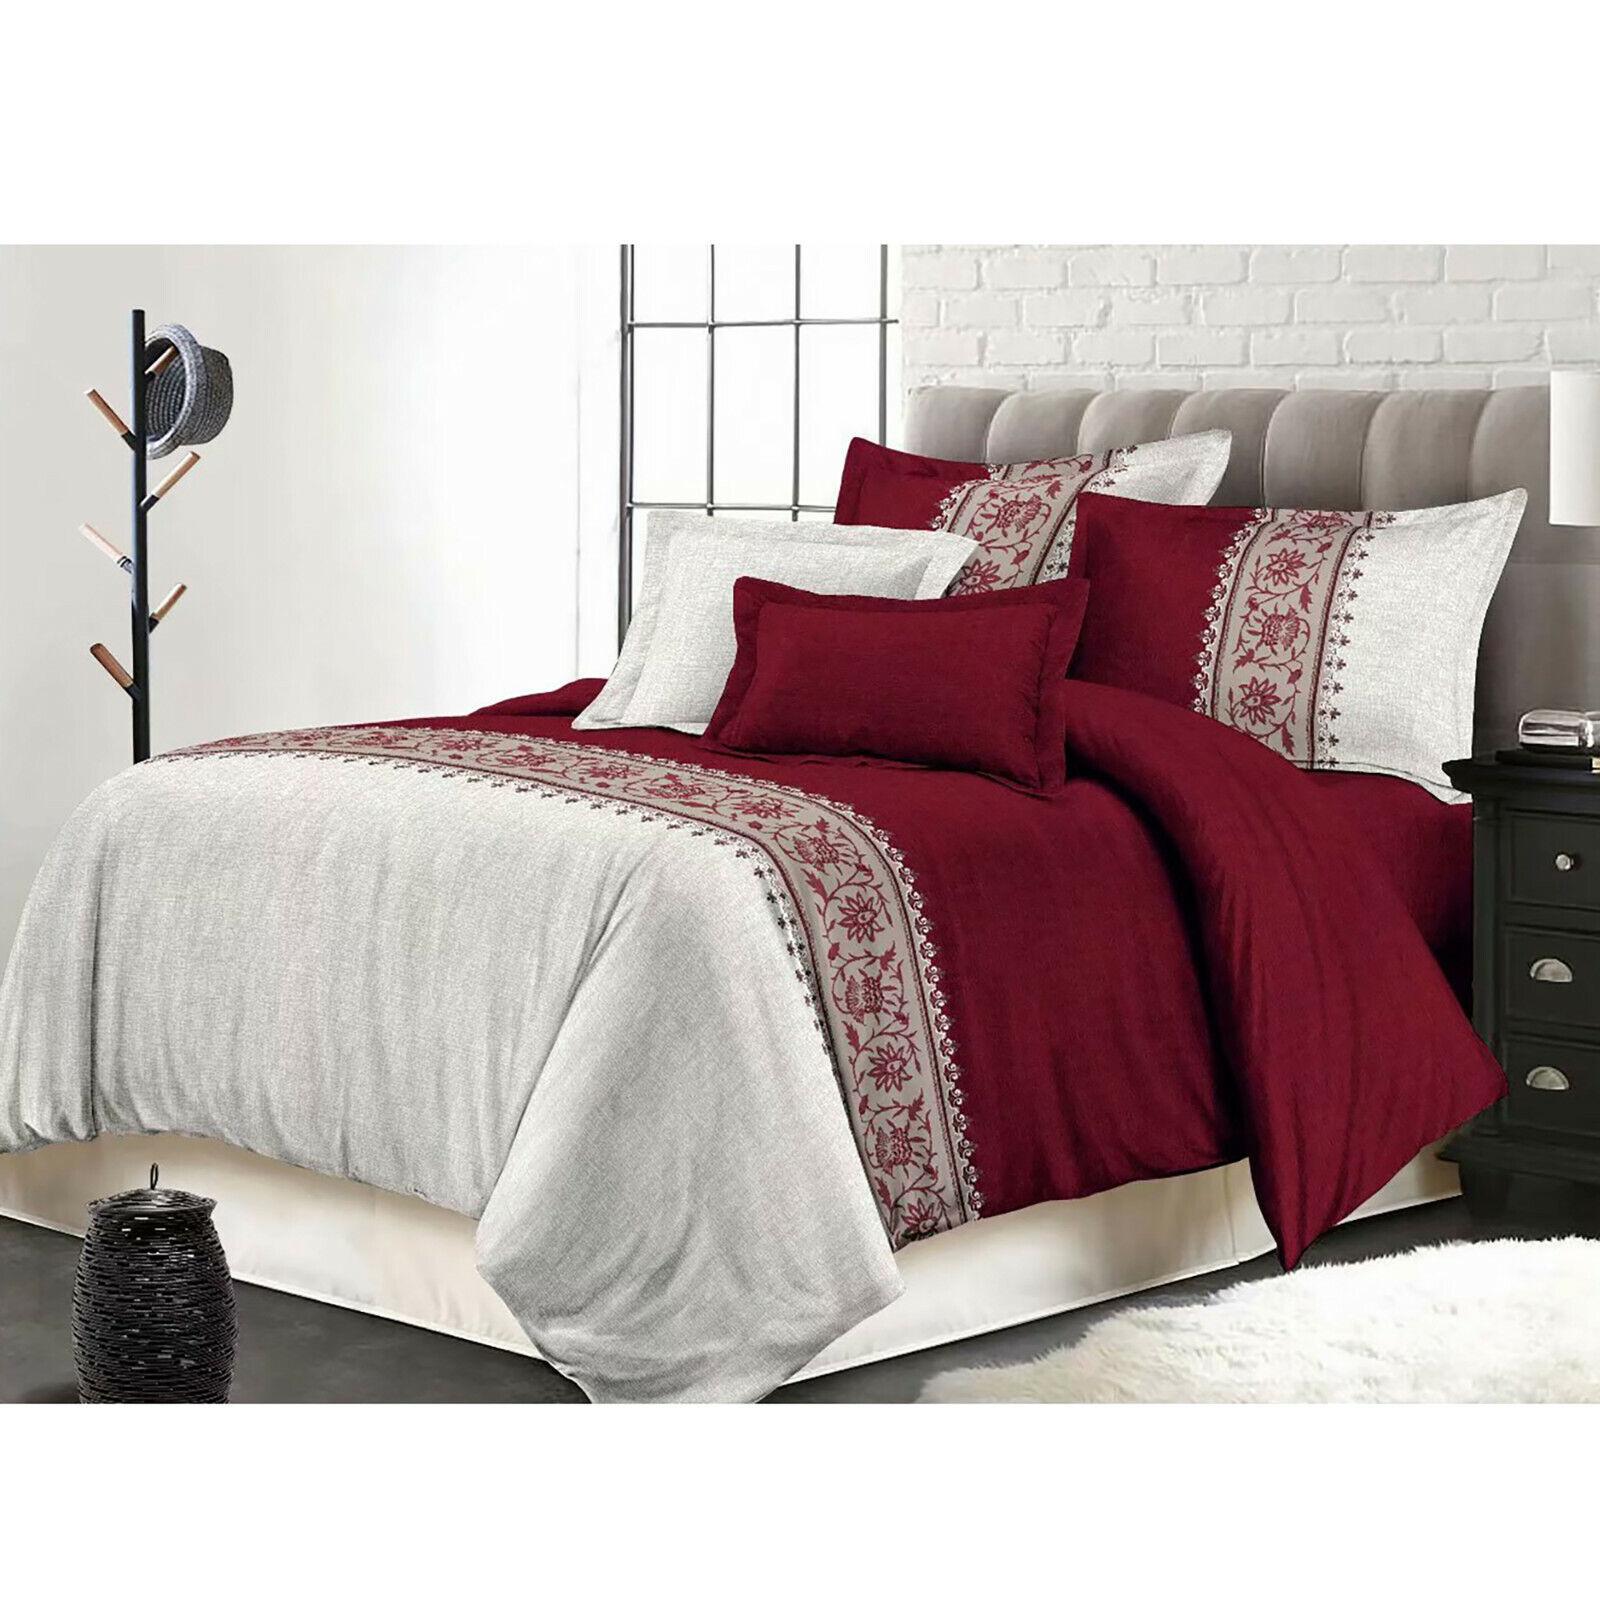 5 Pcs Luxury Bedding Comforter Set Bed In A Bag,King Größe, Keiskei Wine rot